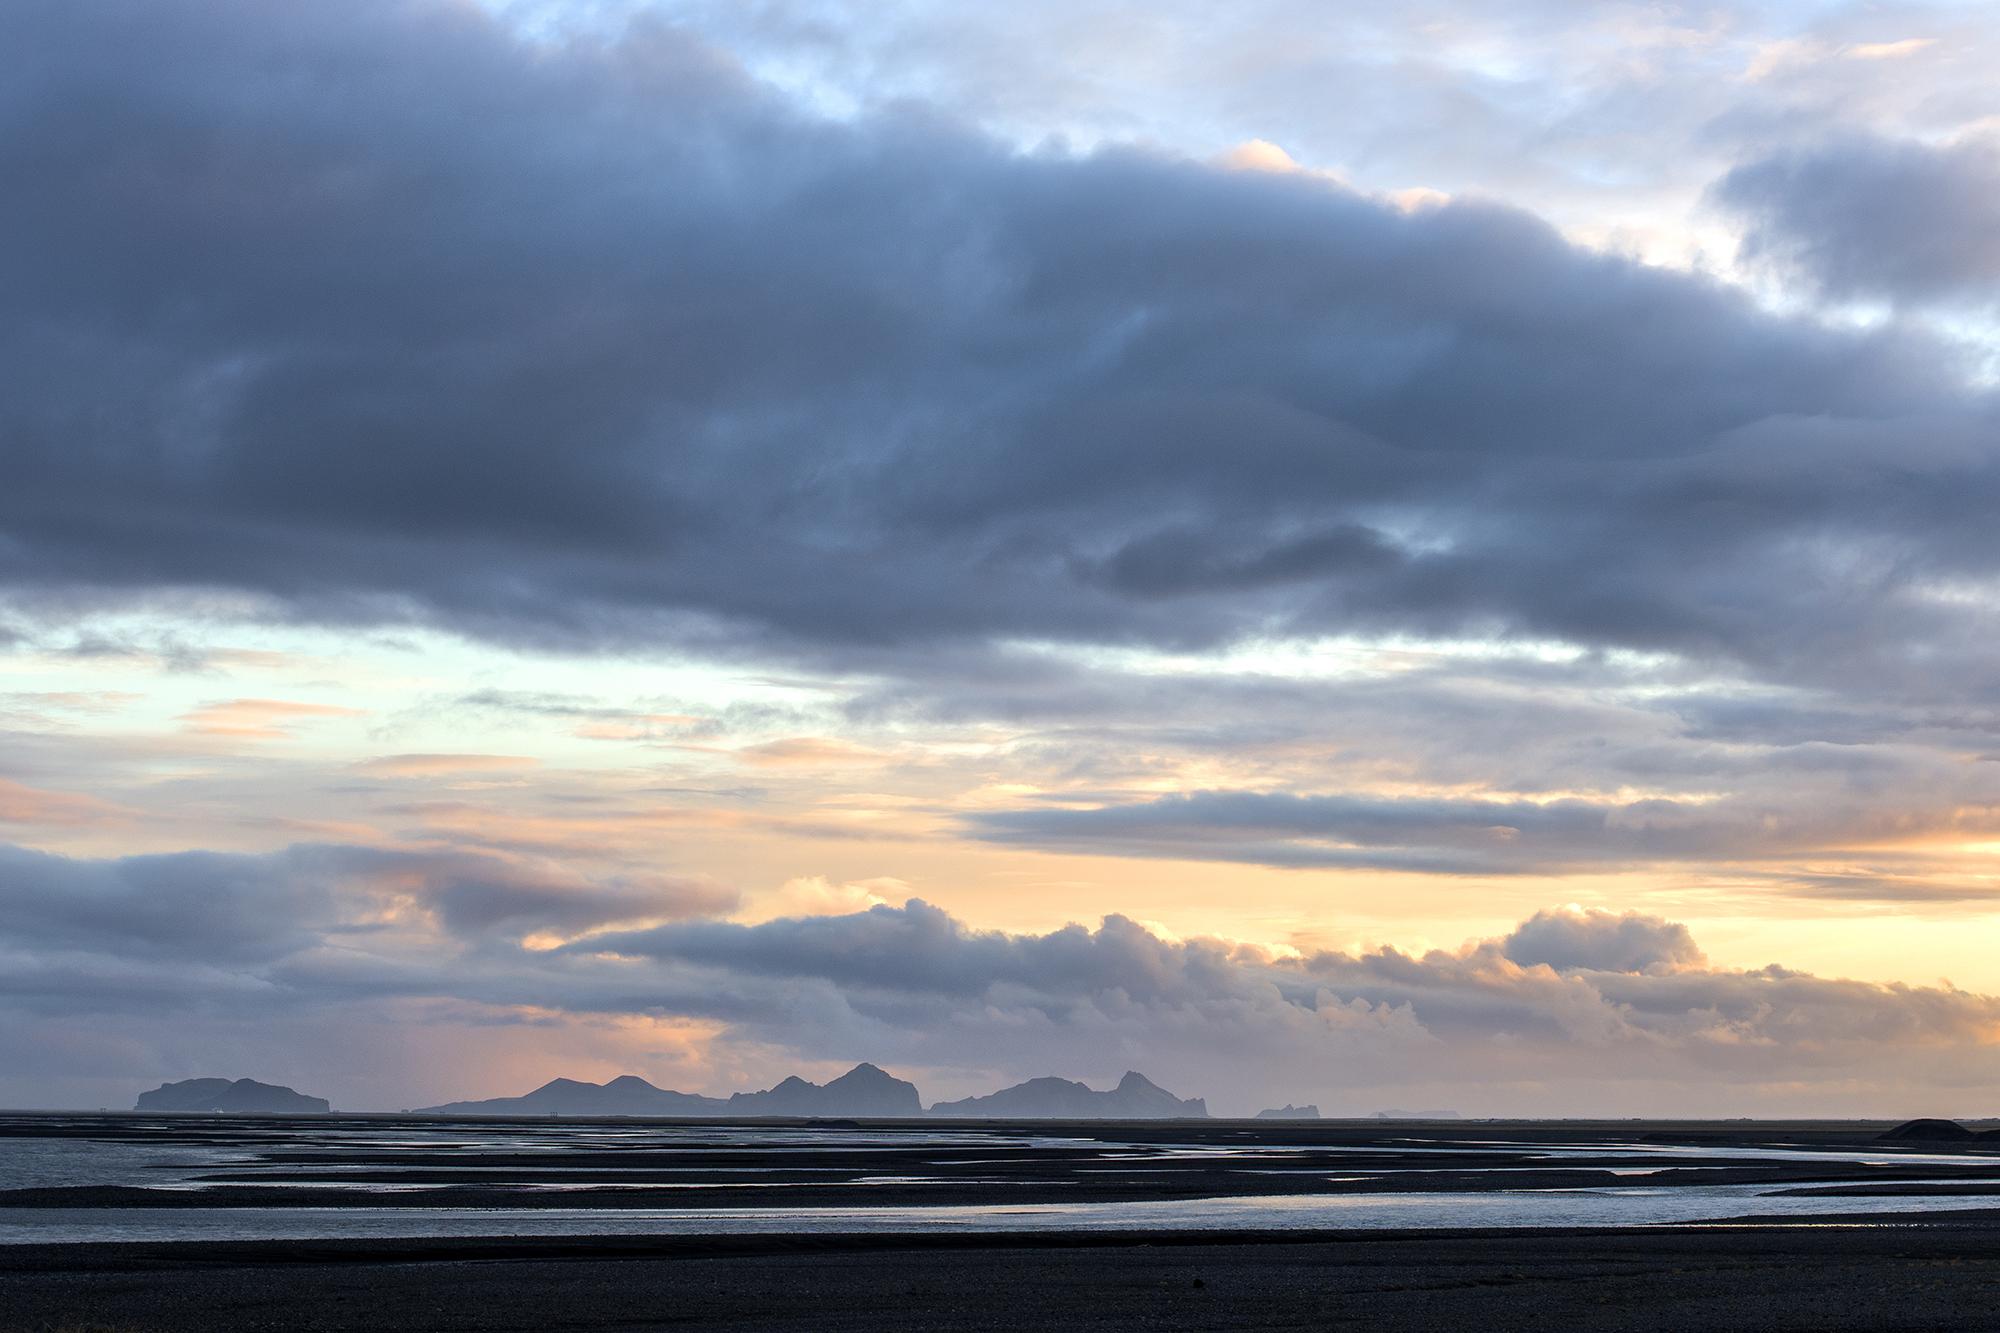 epic sunset over black sand beach